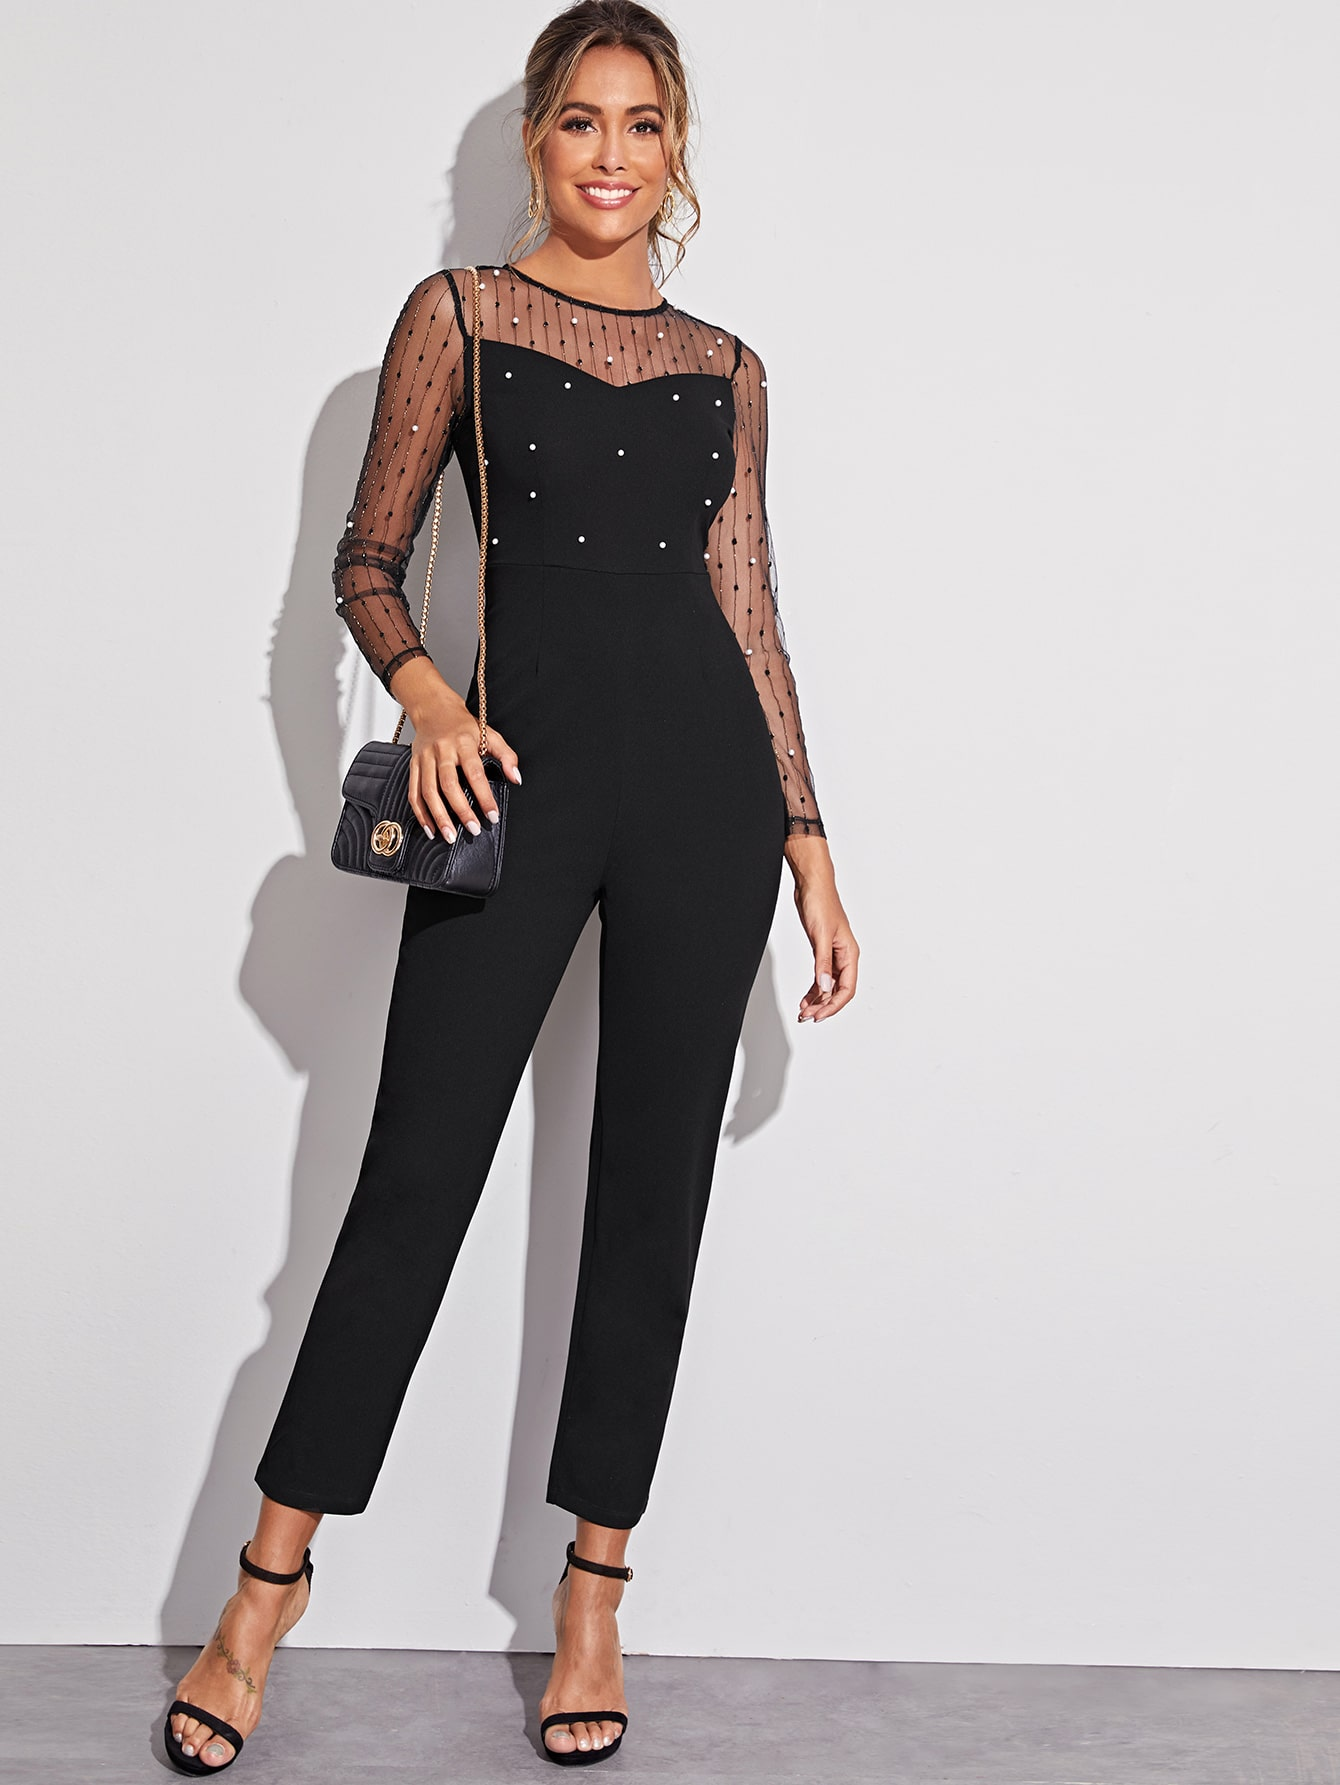 Women Fashion Bodycon Elegant Satin Contrast Mesh Lace Bodysuit Skirt Set